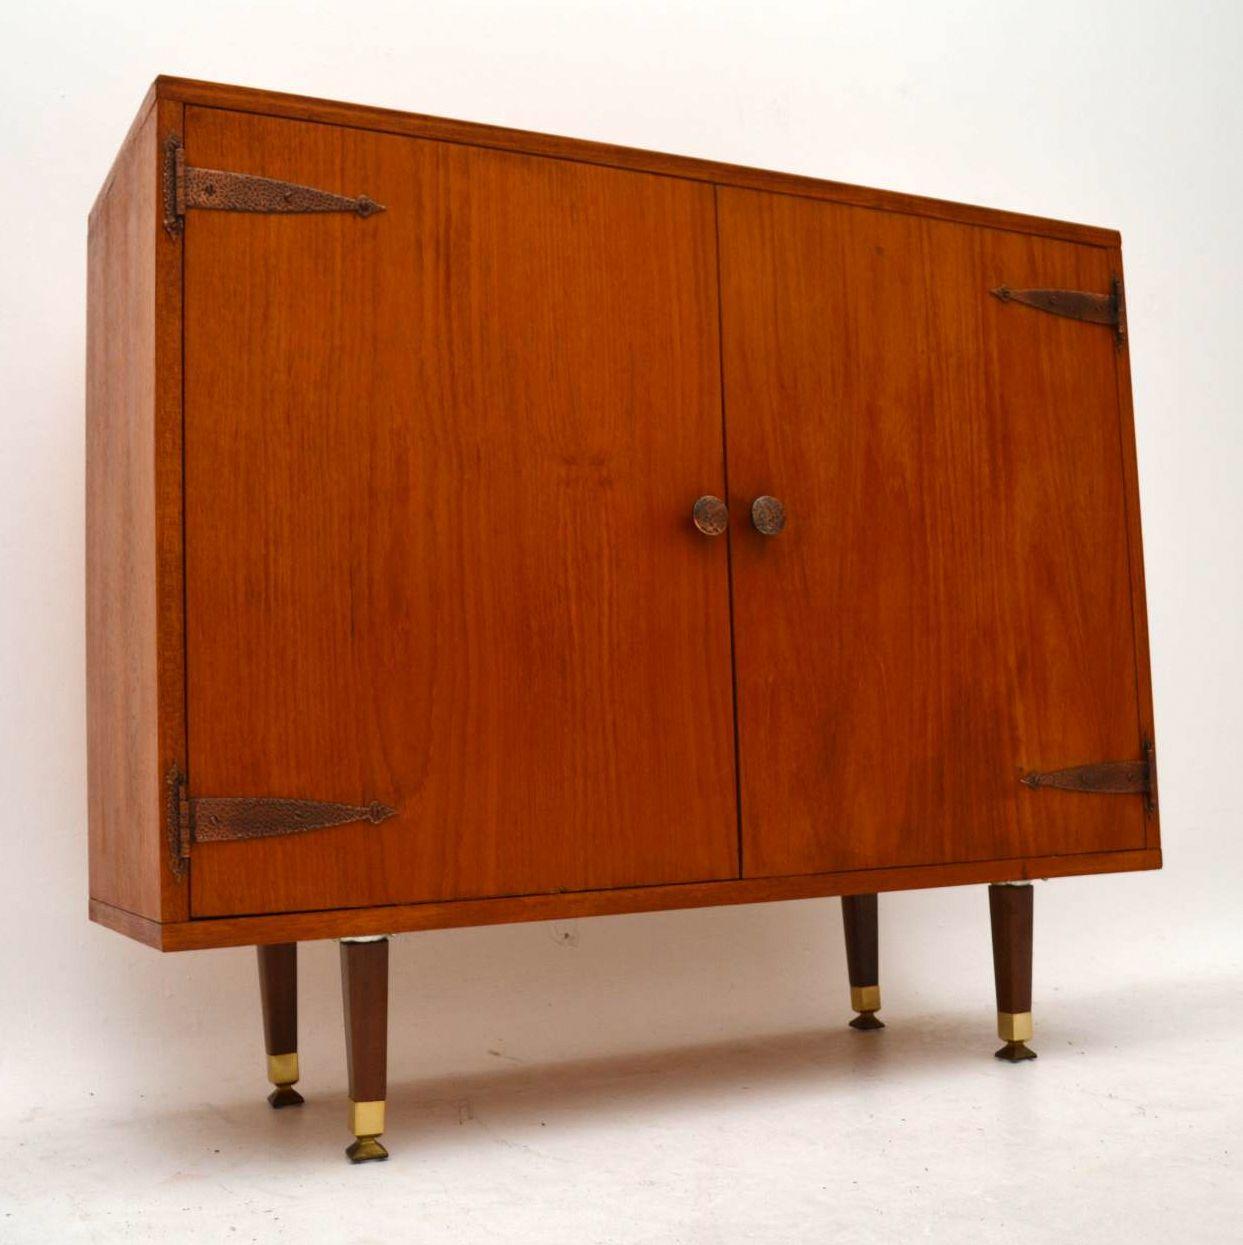 1960's Retro Teak Cabinet / Sideboard